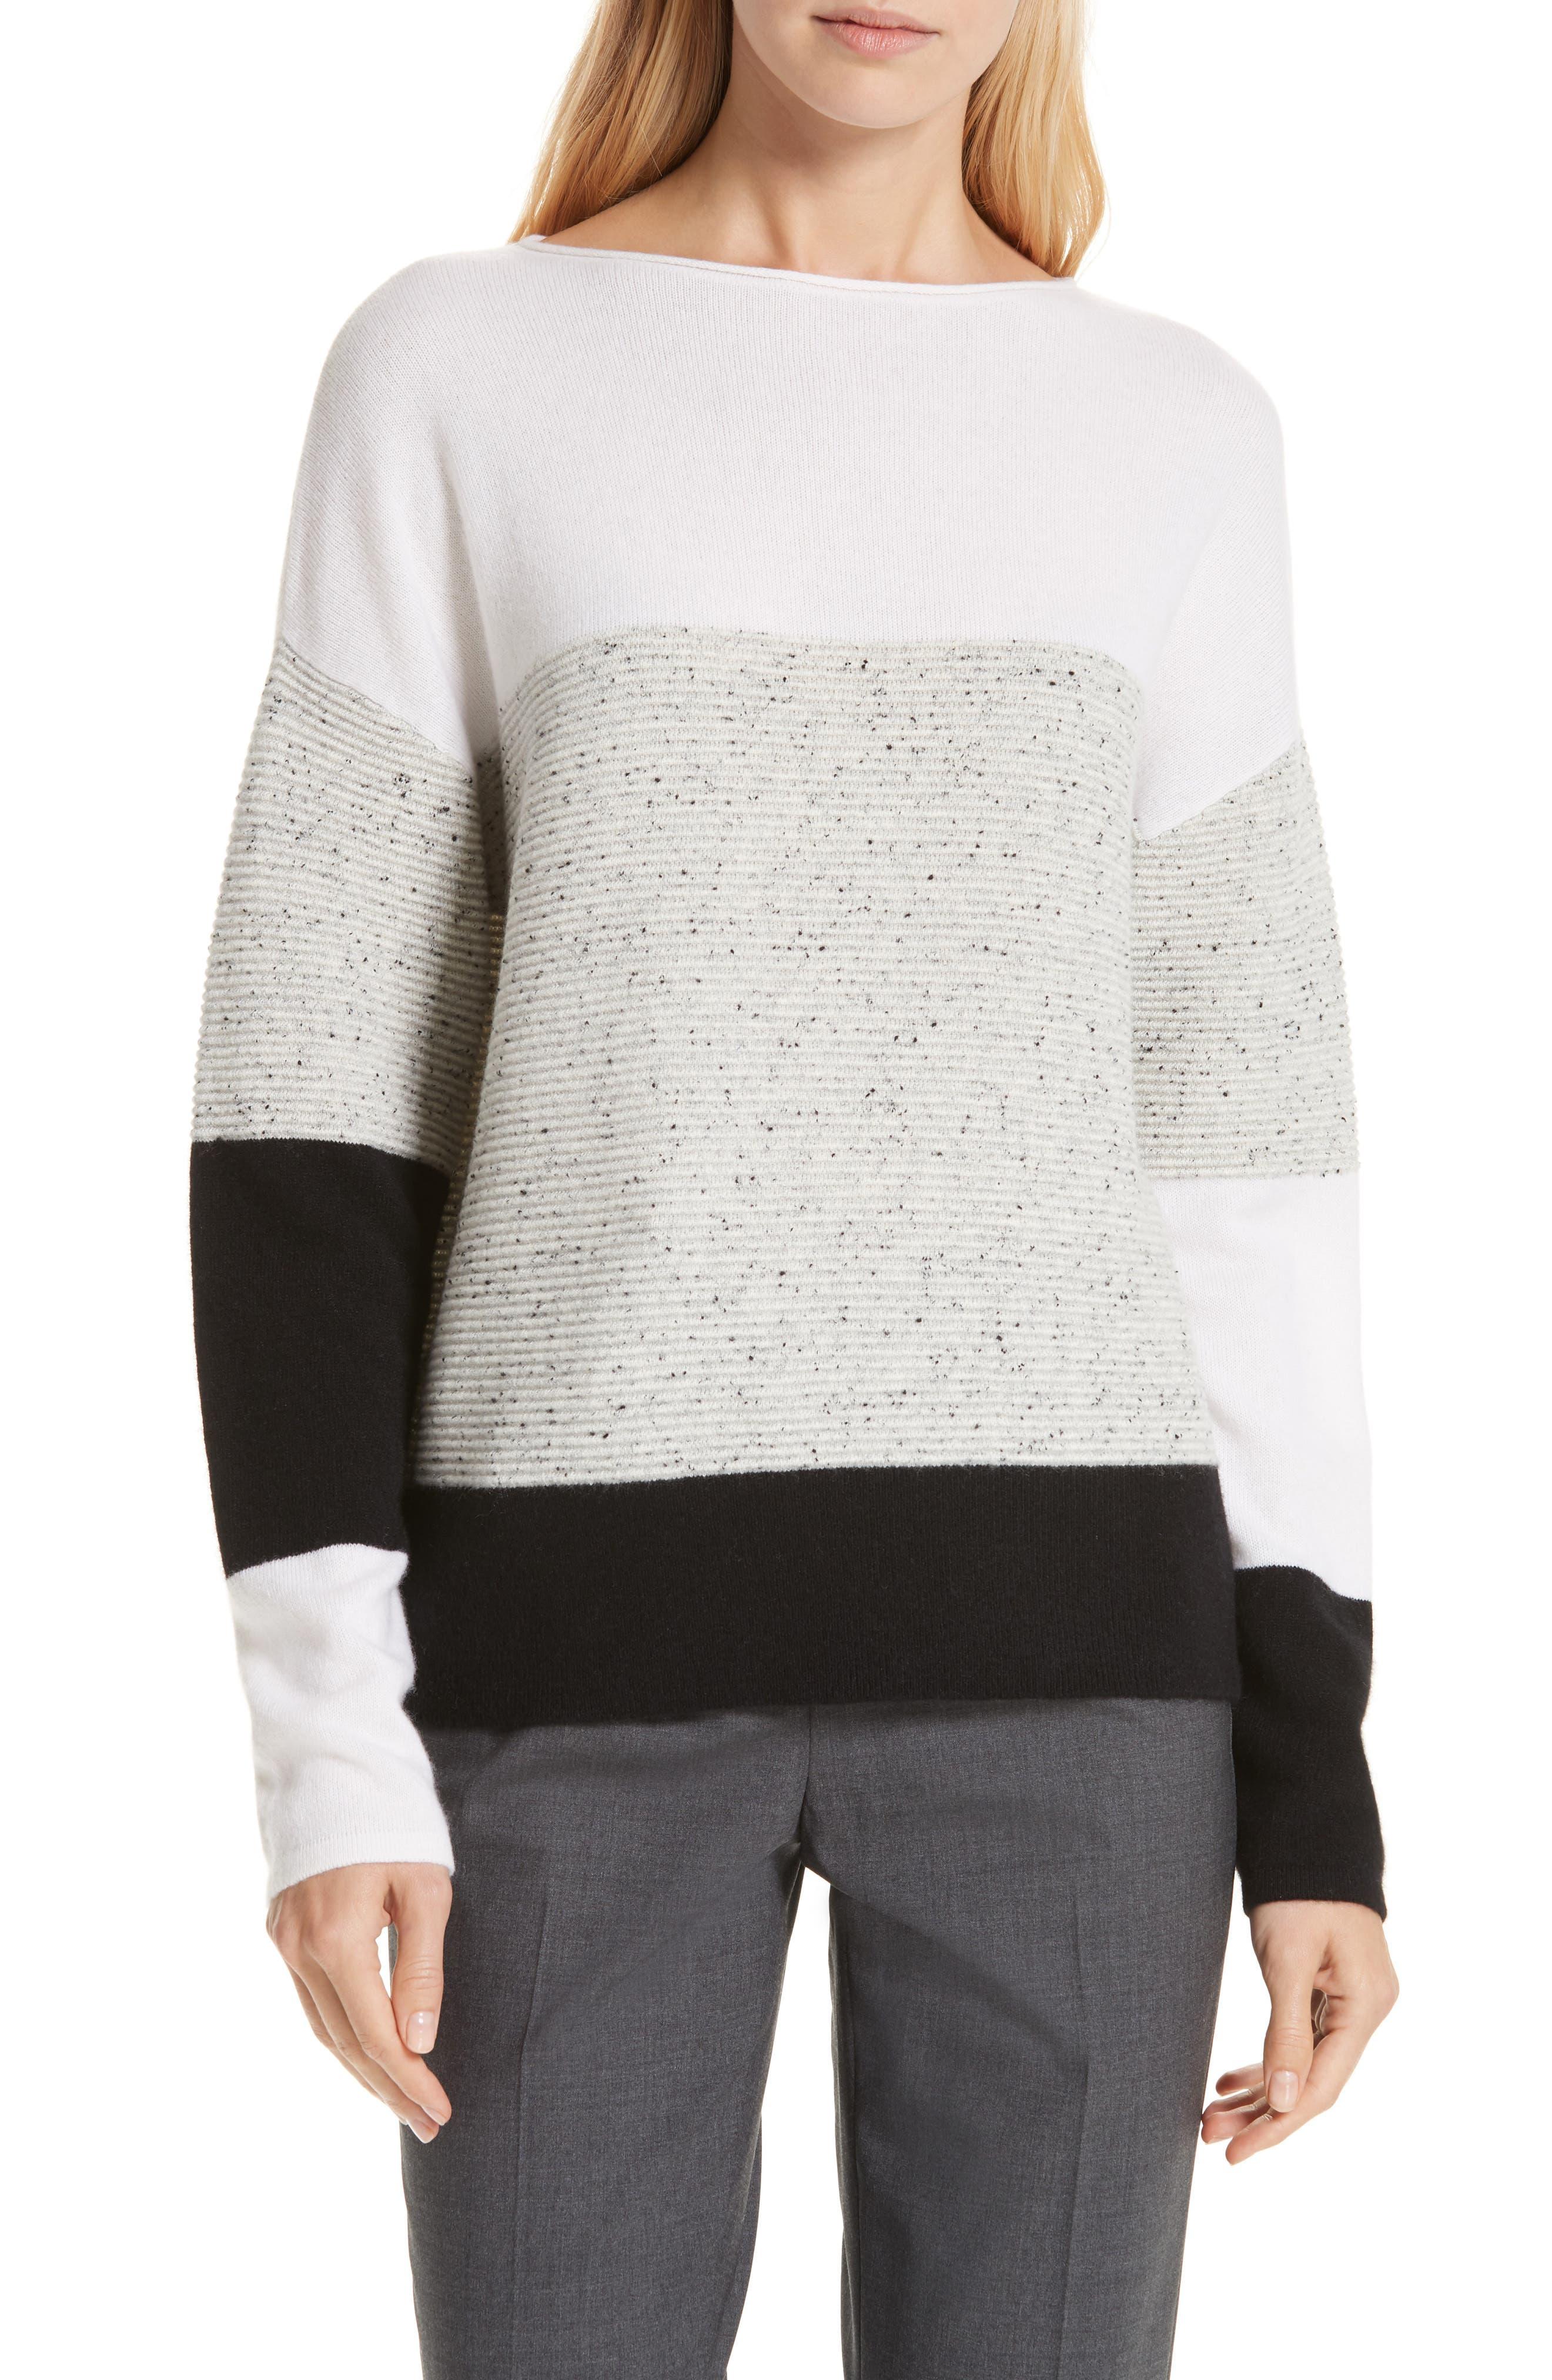 Colorblock Cashmere Sweater, Main, color, IVORY SOFT MULTI COLOR BLOCK